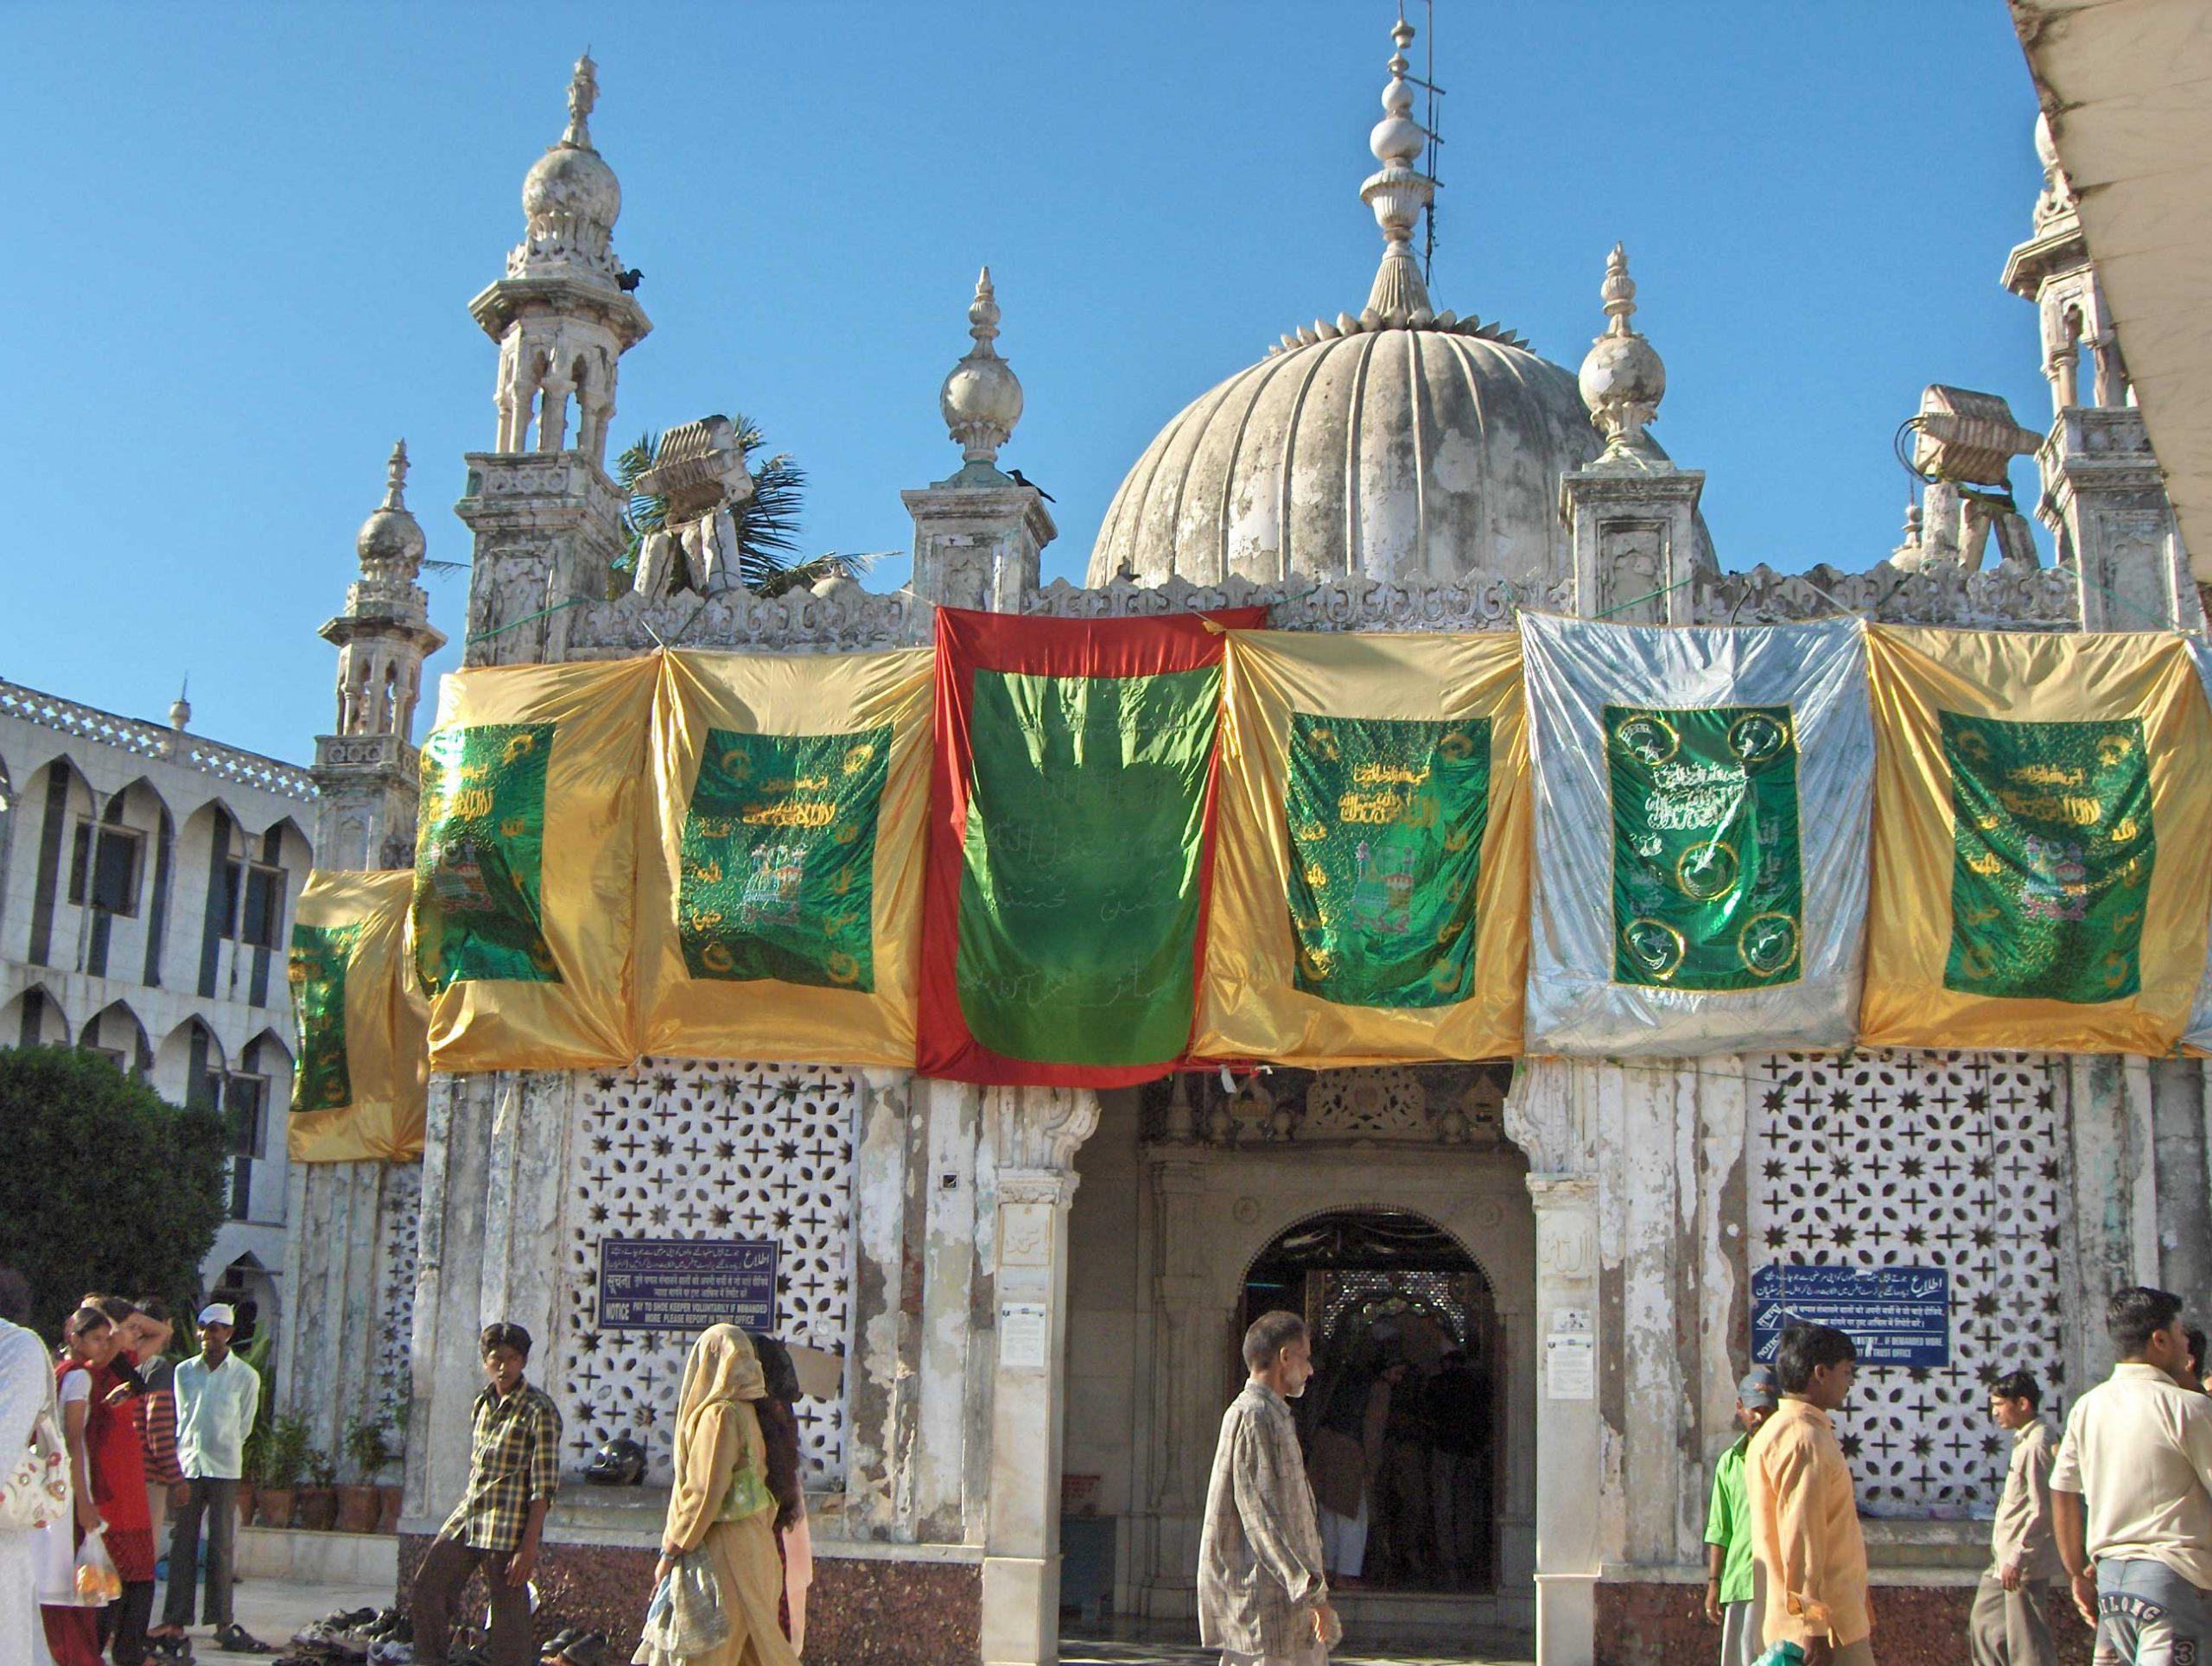 آرامگاه حاج علی بمبئی